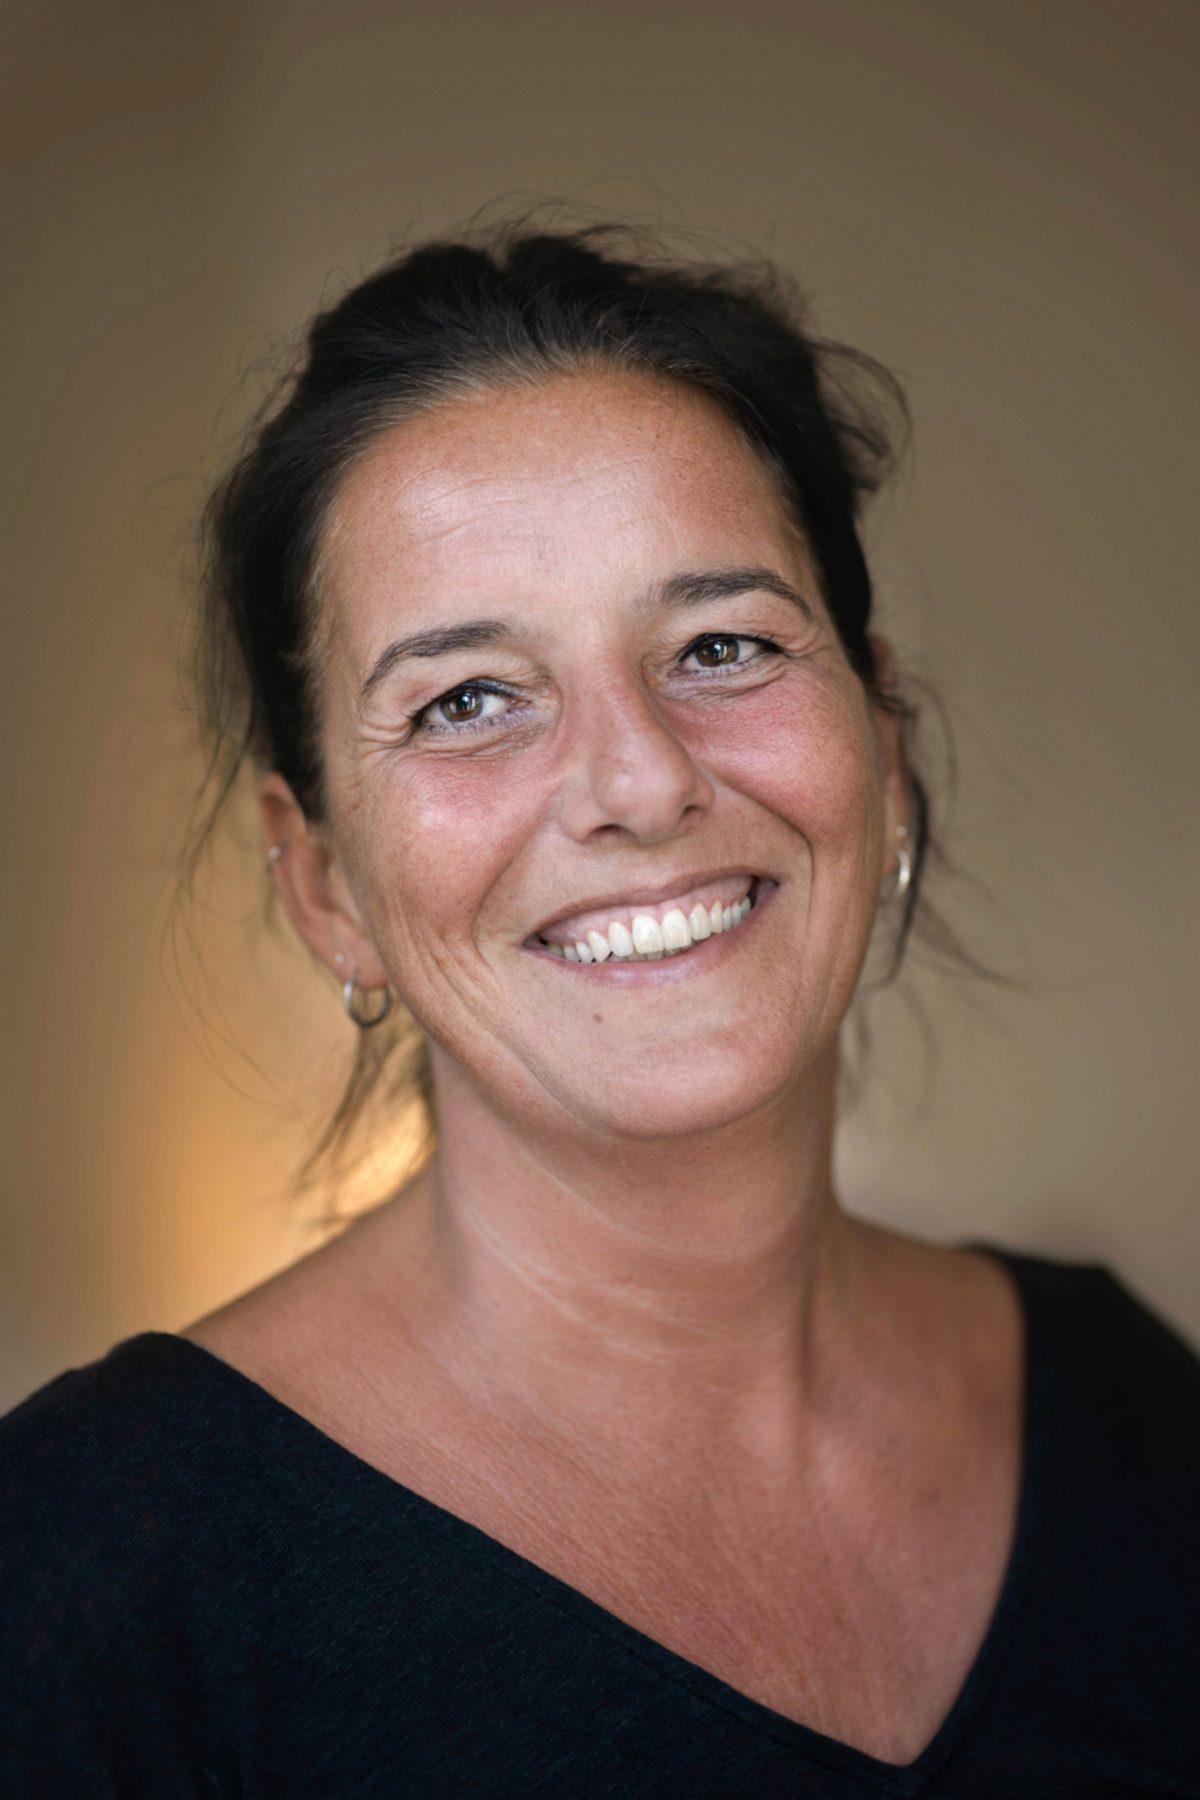 Lara van Roest